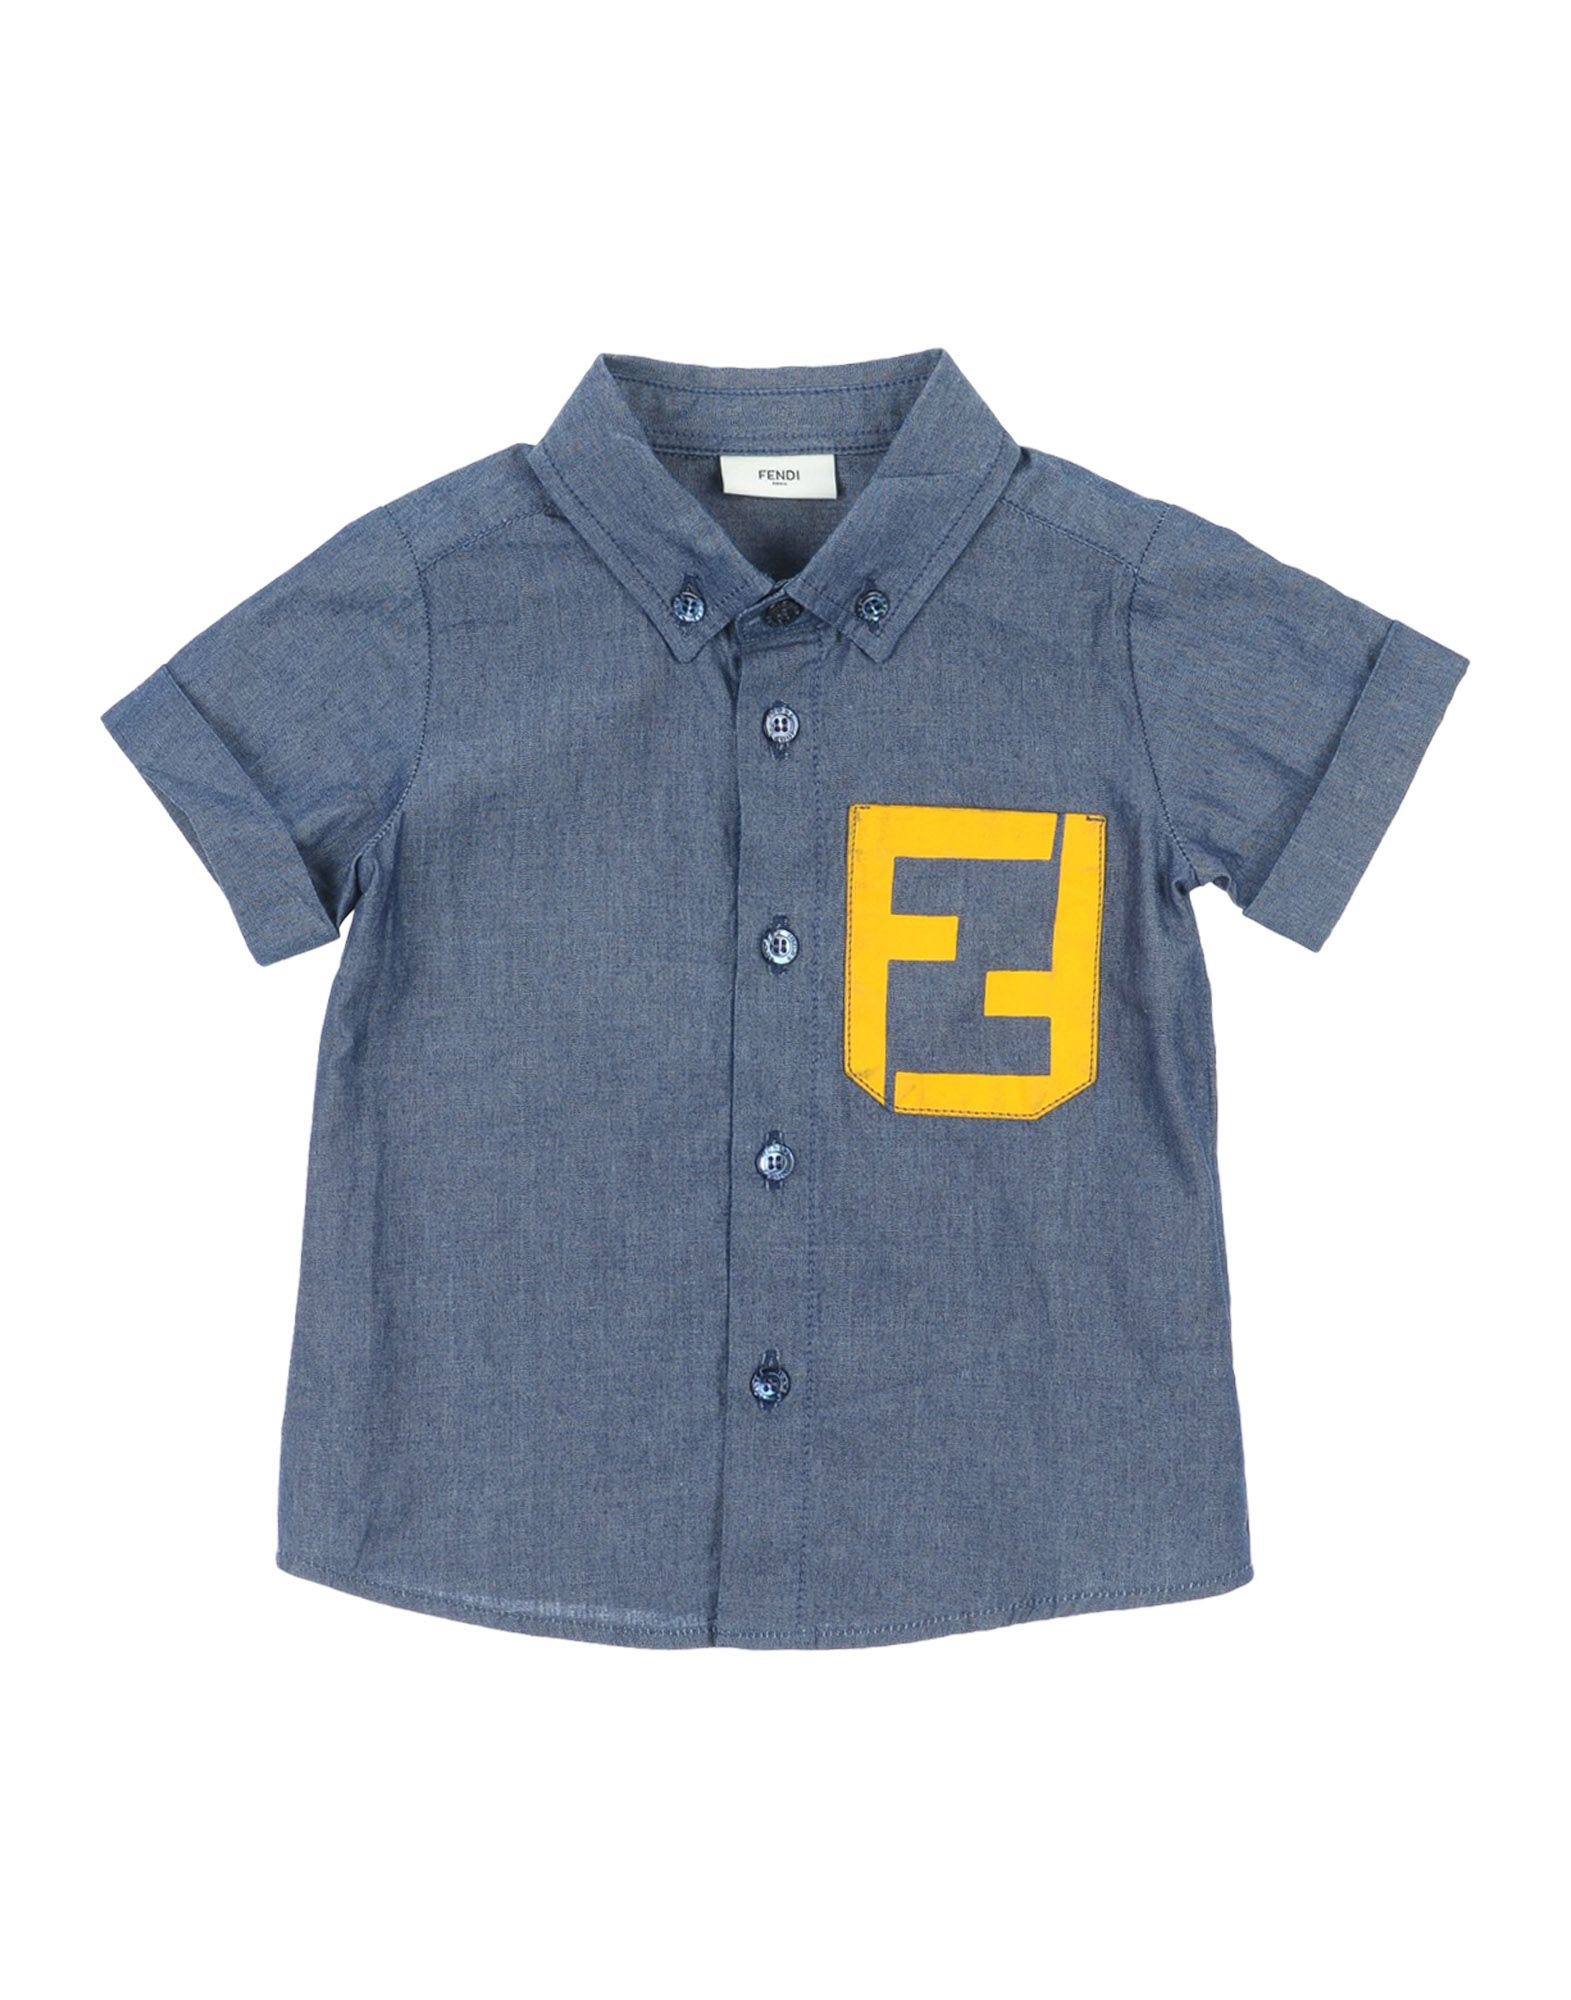 FENDI Jungen 0-24 monate Jeanshemd Farbe Blau Größe 4